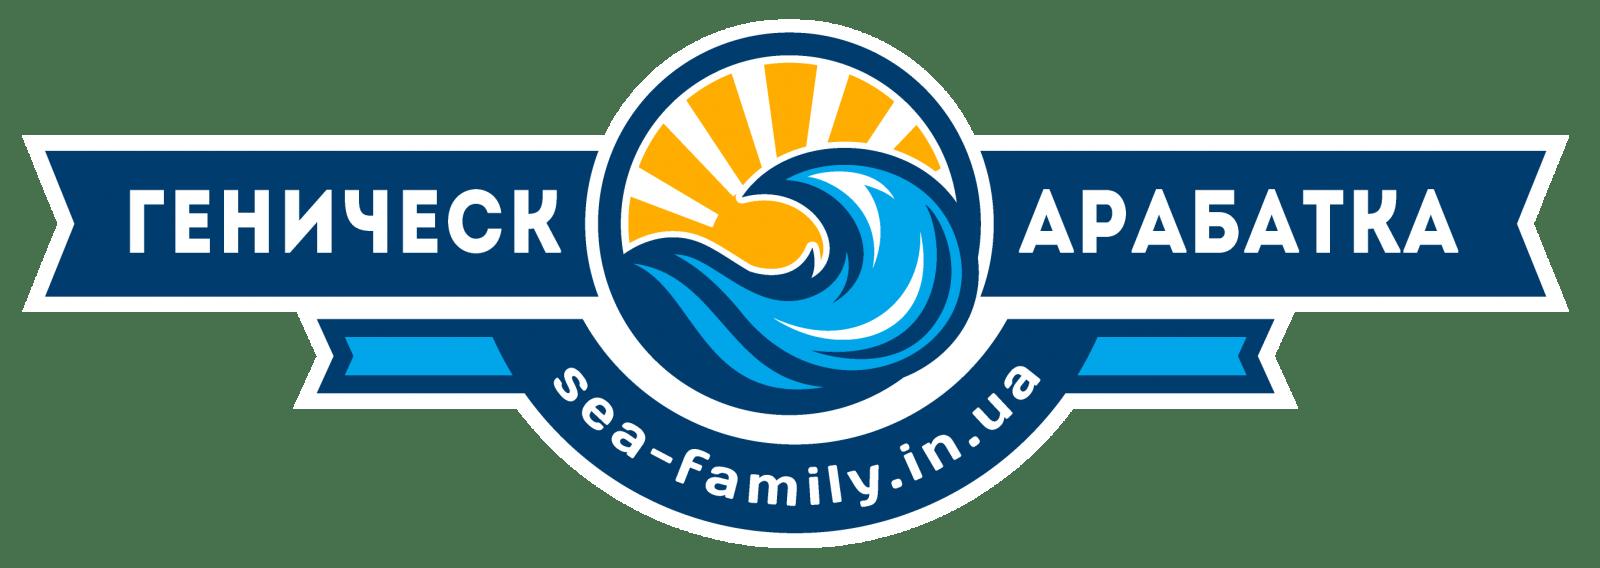 SEA-family